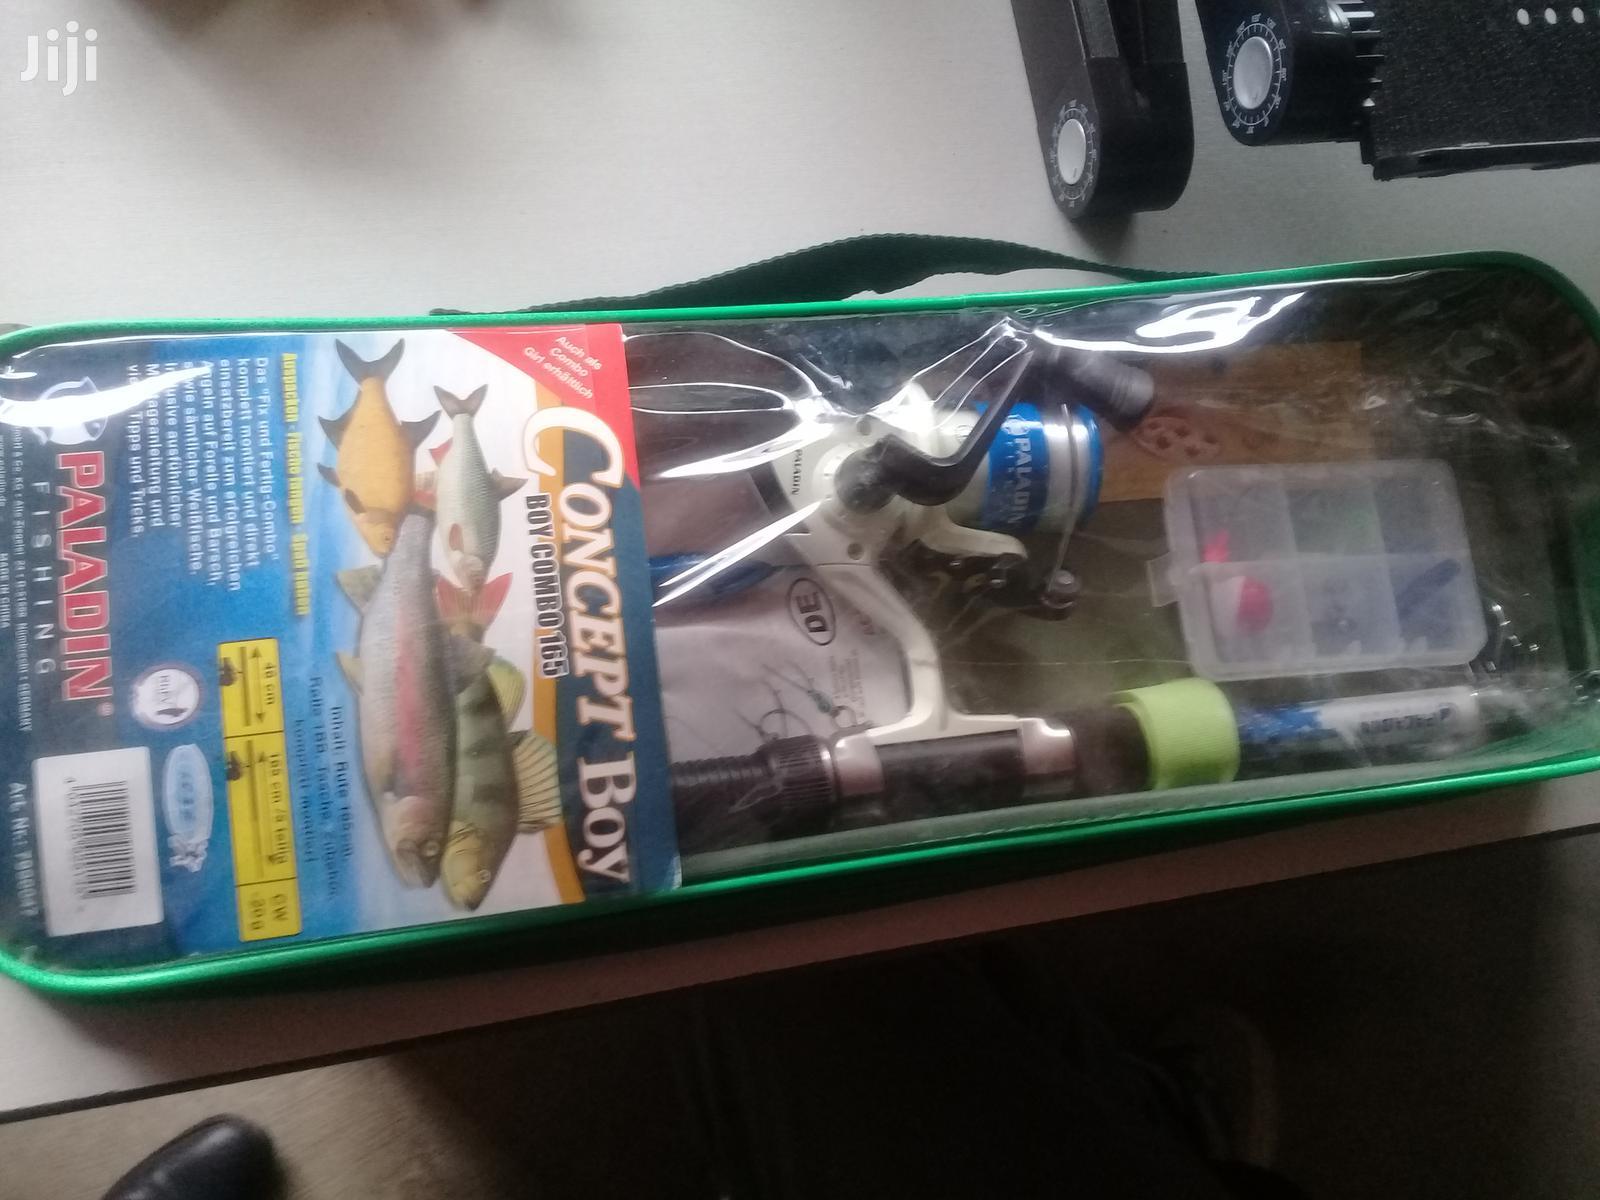 Paladin Fishing Rod And Reel